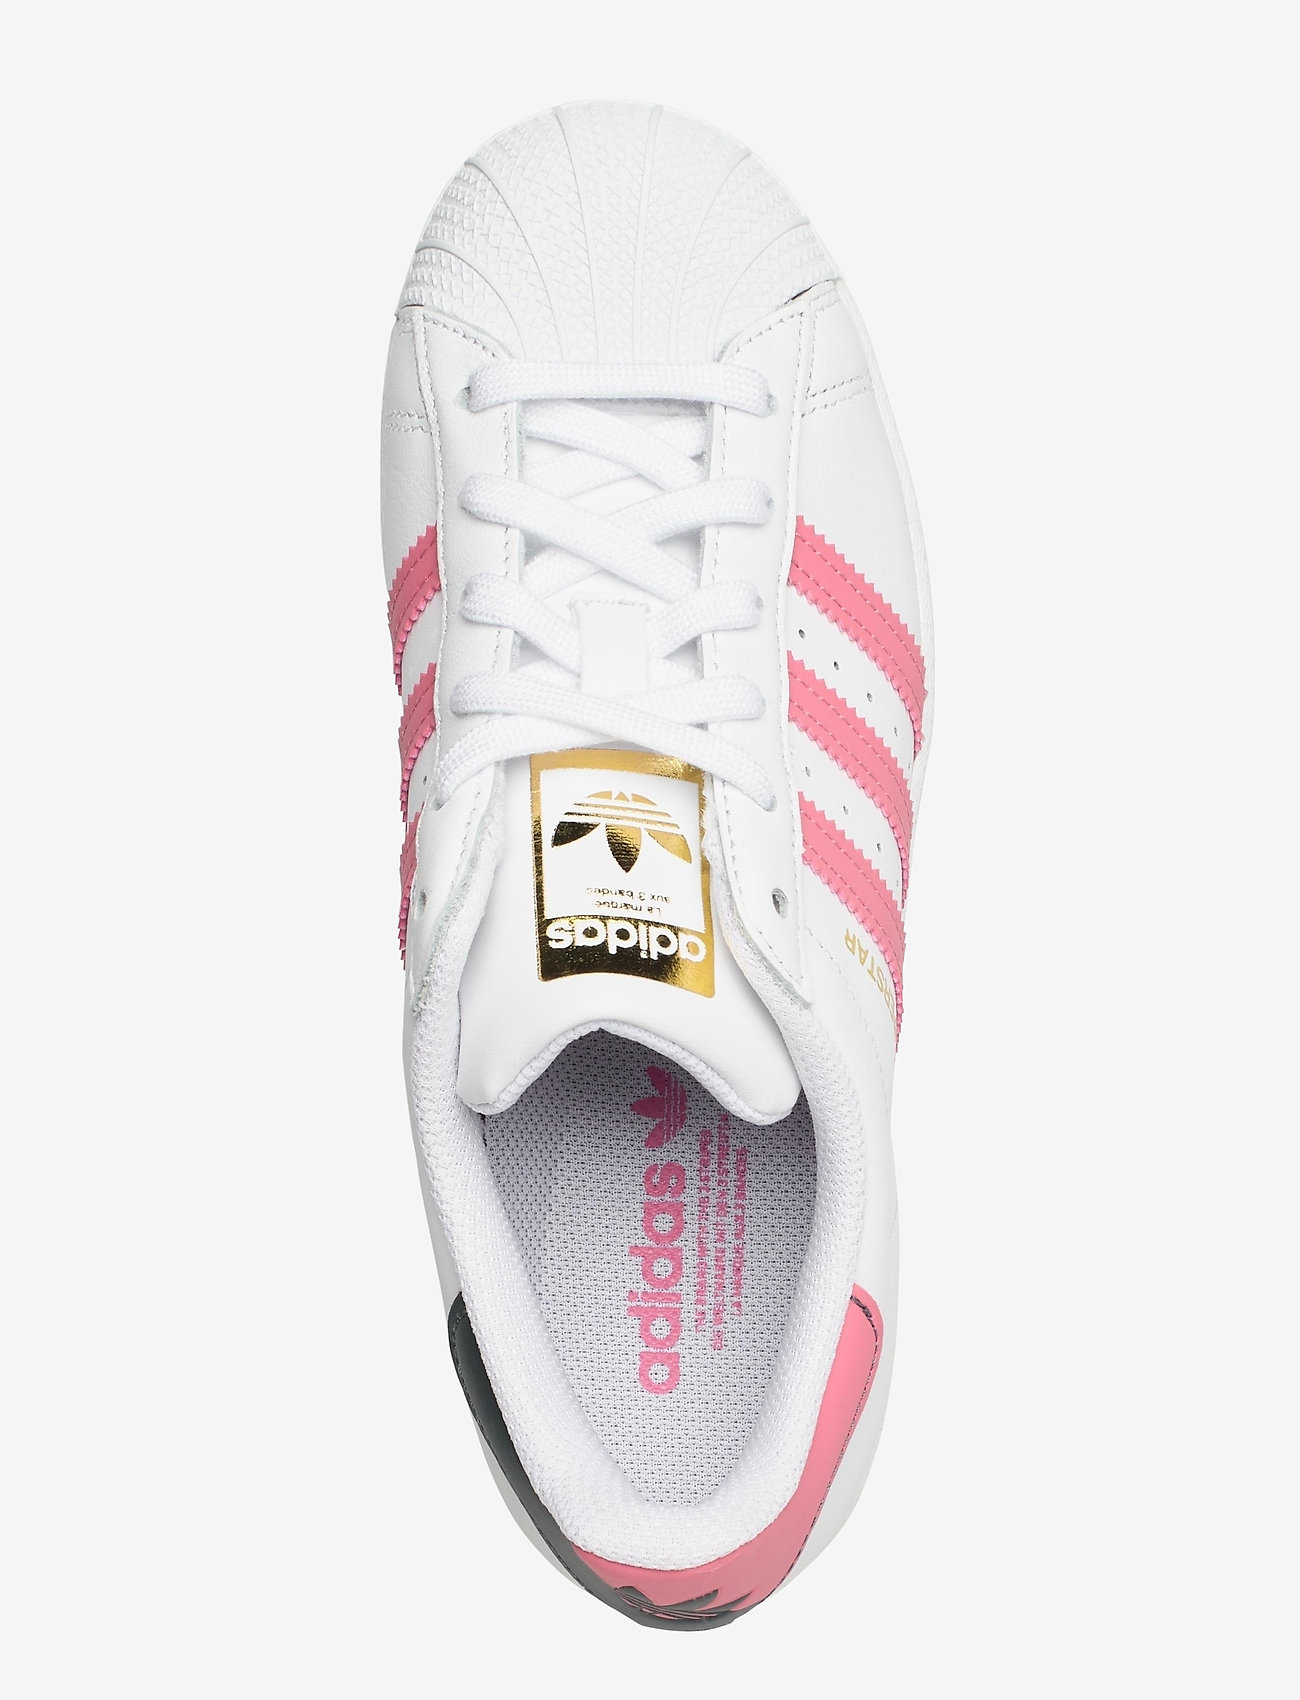 adidas Originals - Superstar W - low top sneakers - ftwwht/bluoxi/goldmt - 3